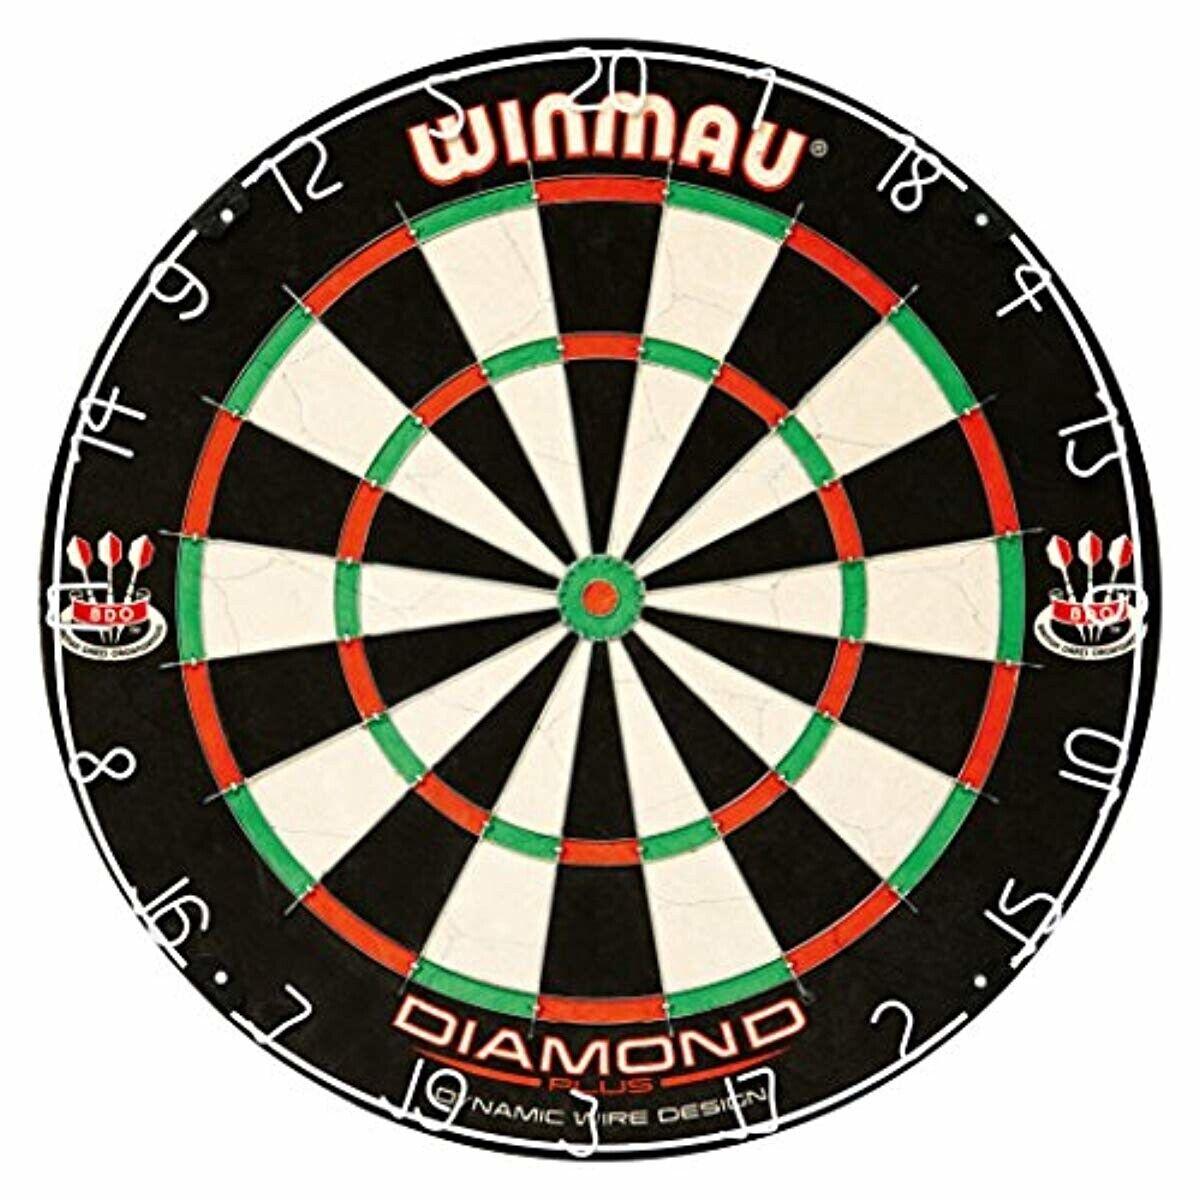 Winmau Diamond Plus Tournament Bristle Dartboard with Staple